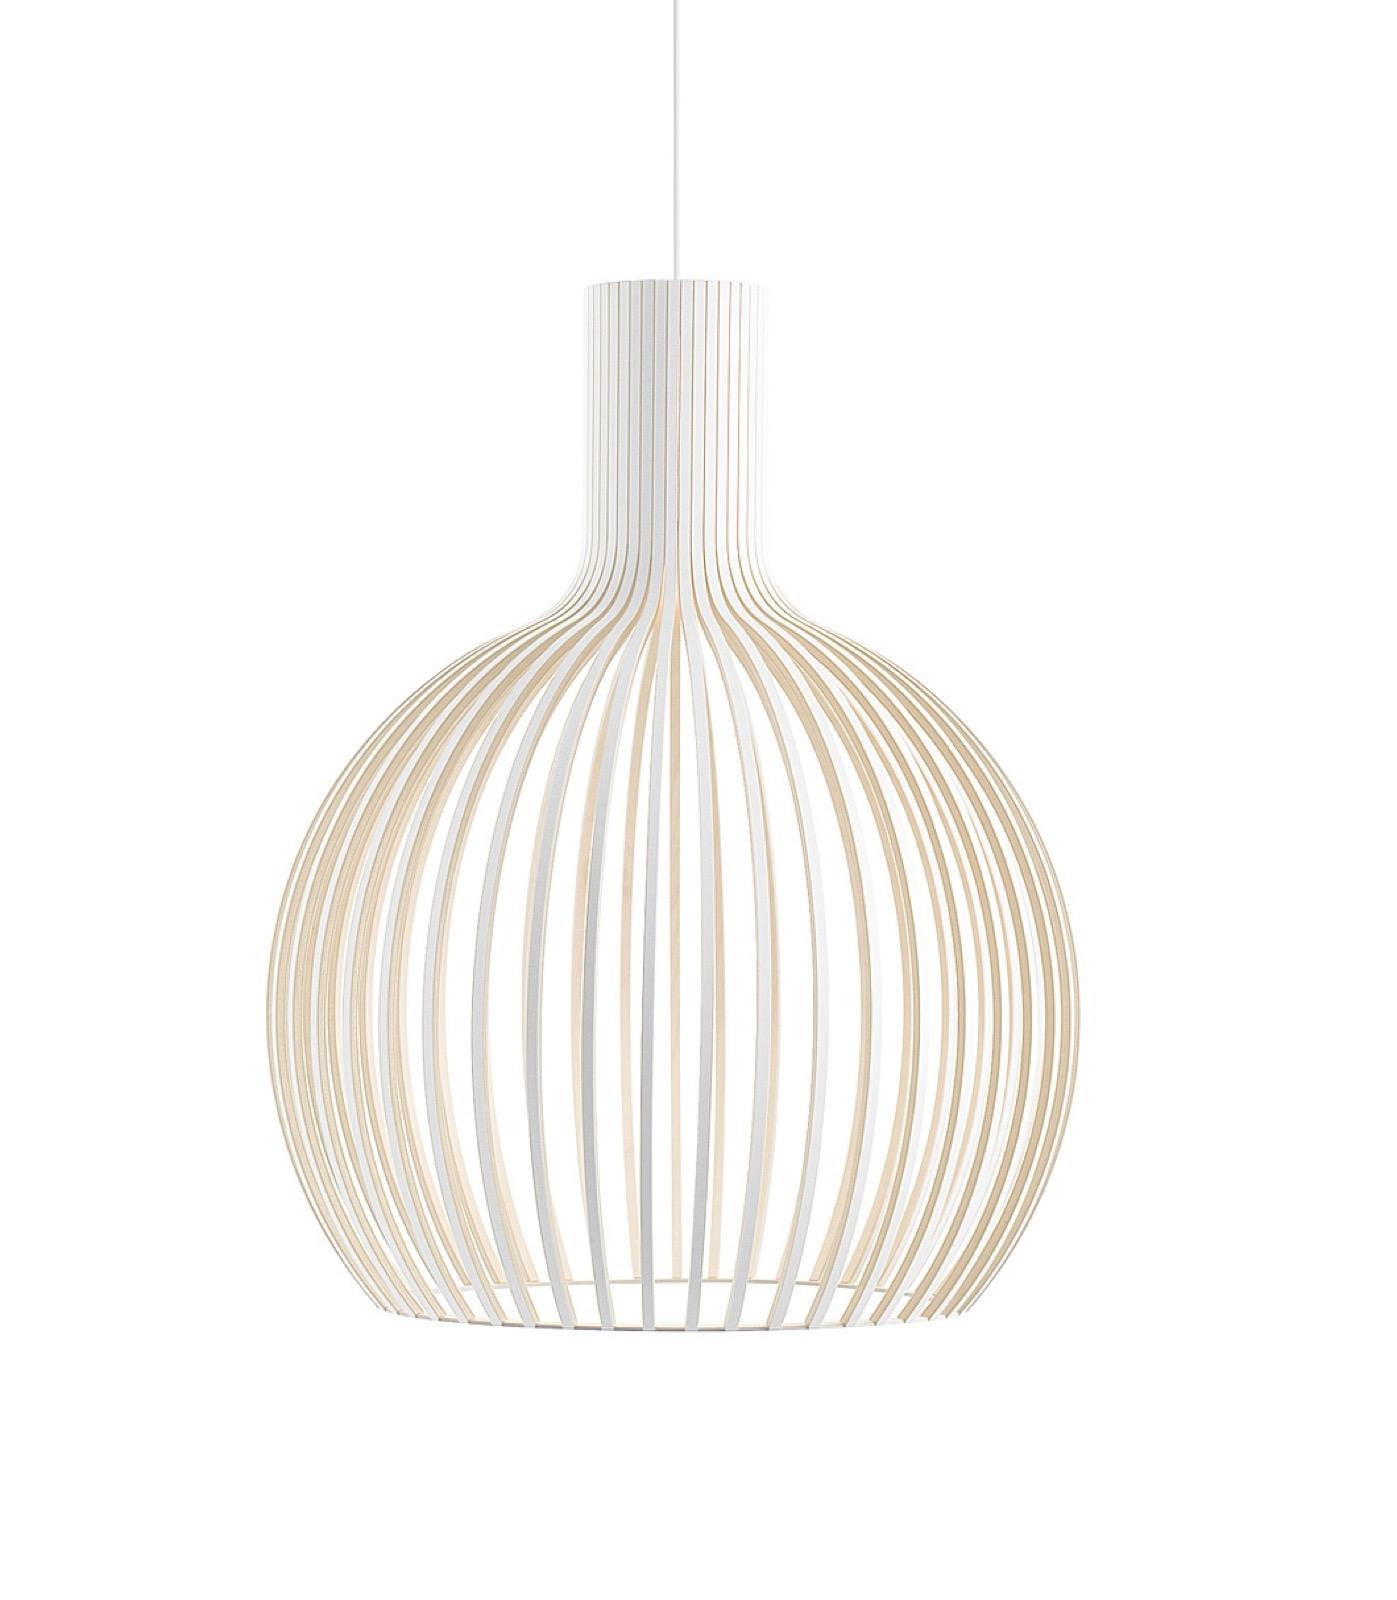 Secto Design Octo 4240 hanglamp | Matser Wageningen